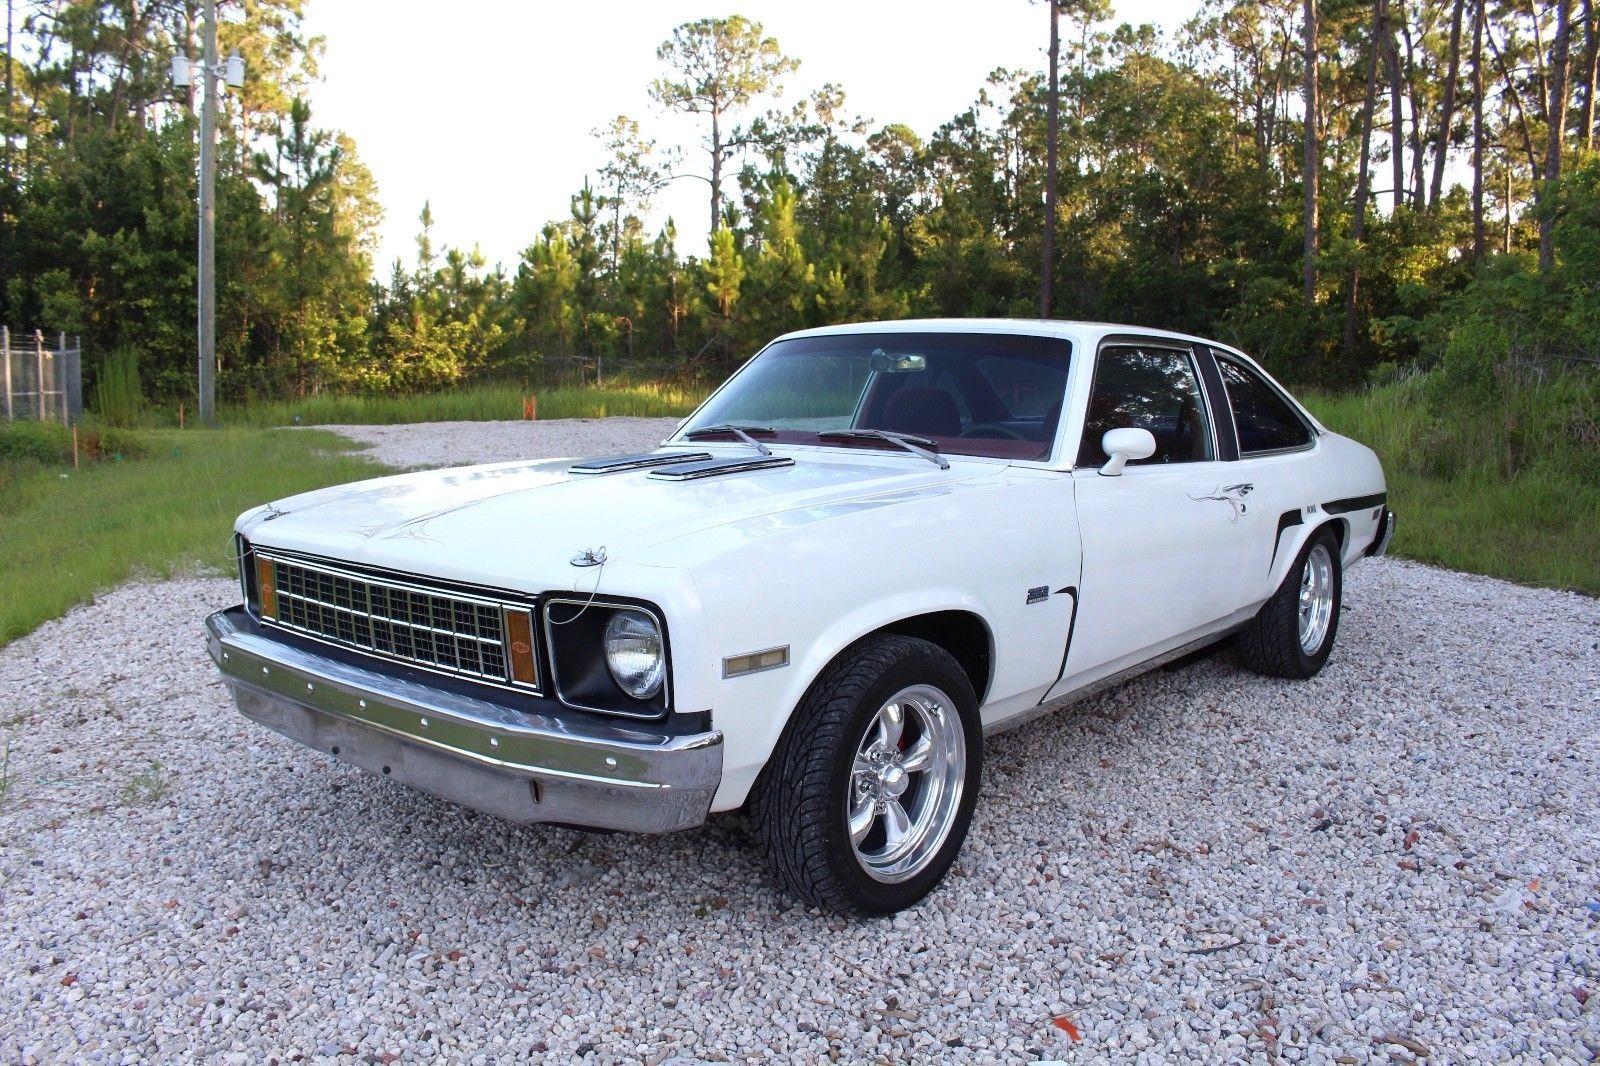 Great 1977 Chevrolet Nova Concours Hotrod 383 Stroker Chevrolet